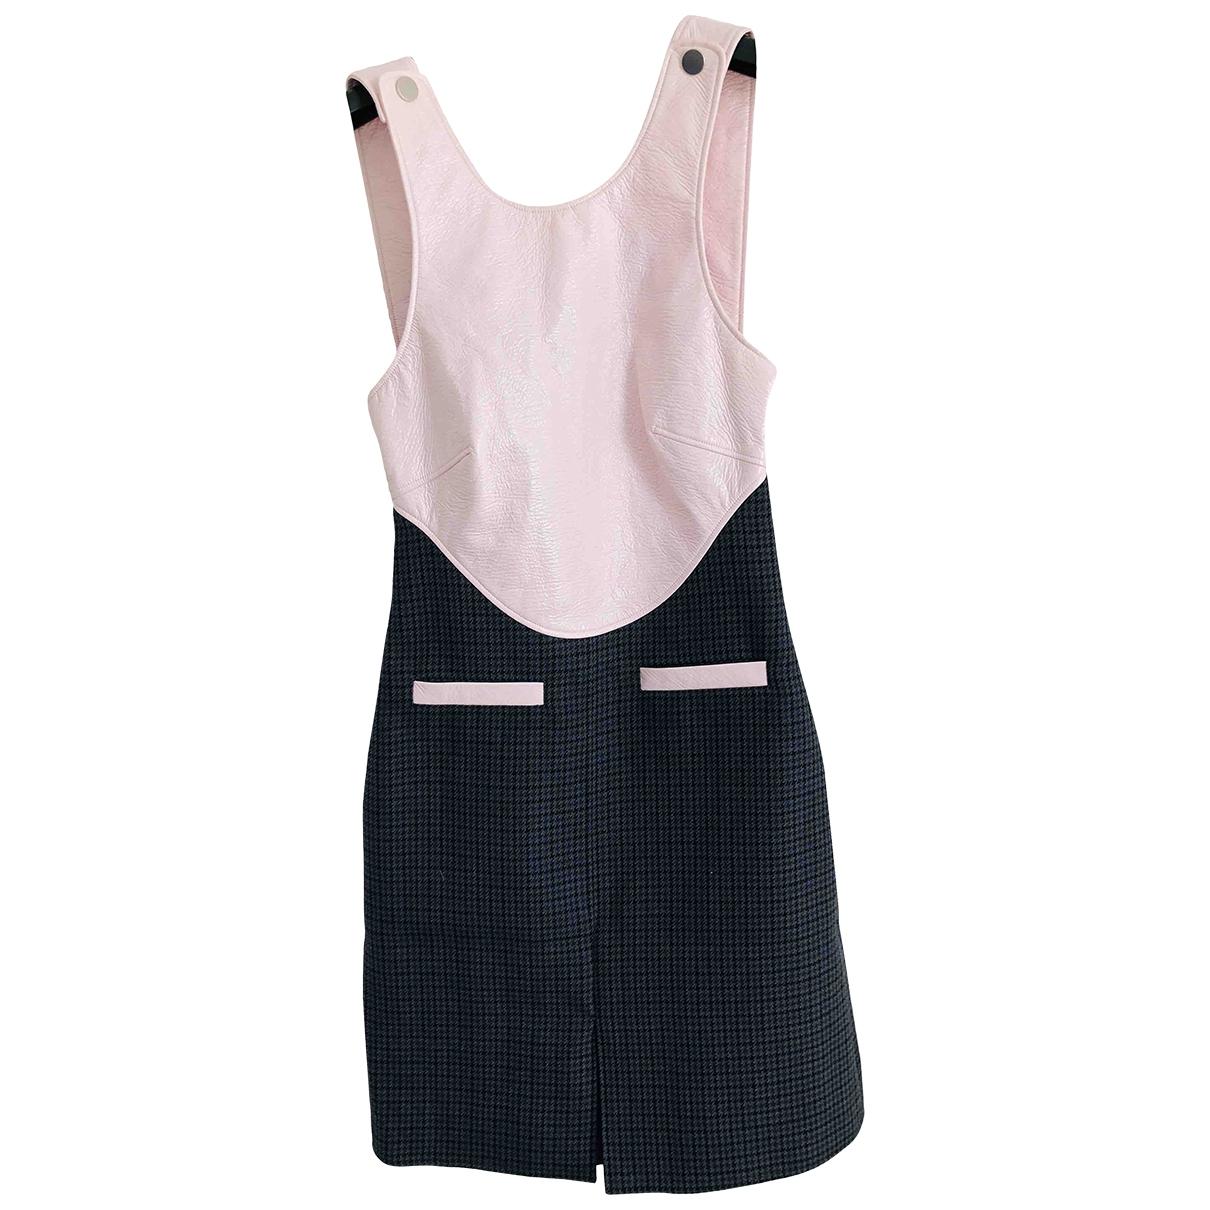 Courrèges \N Multicolour Wool dress for Women 36 FR